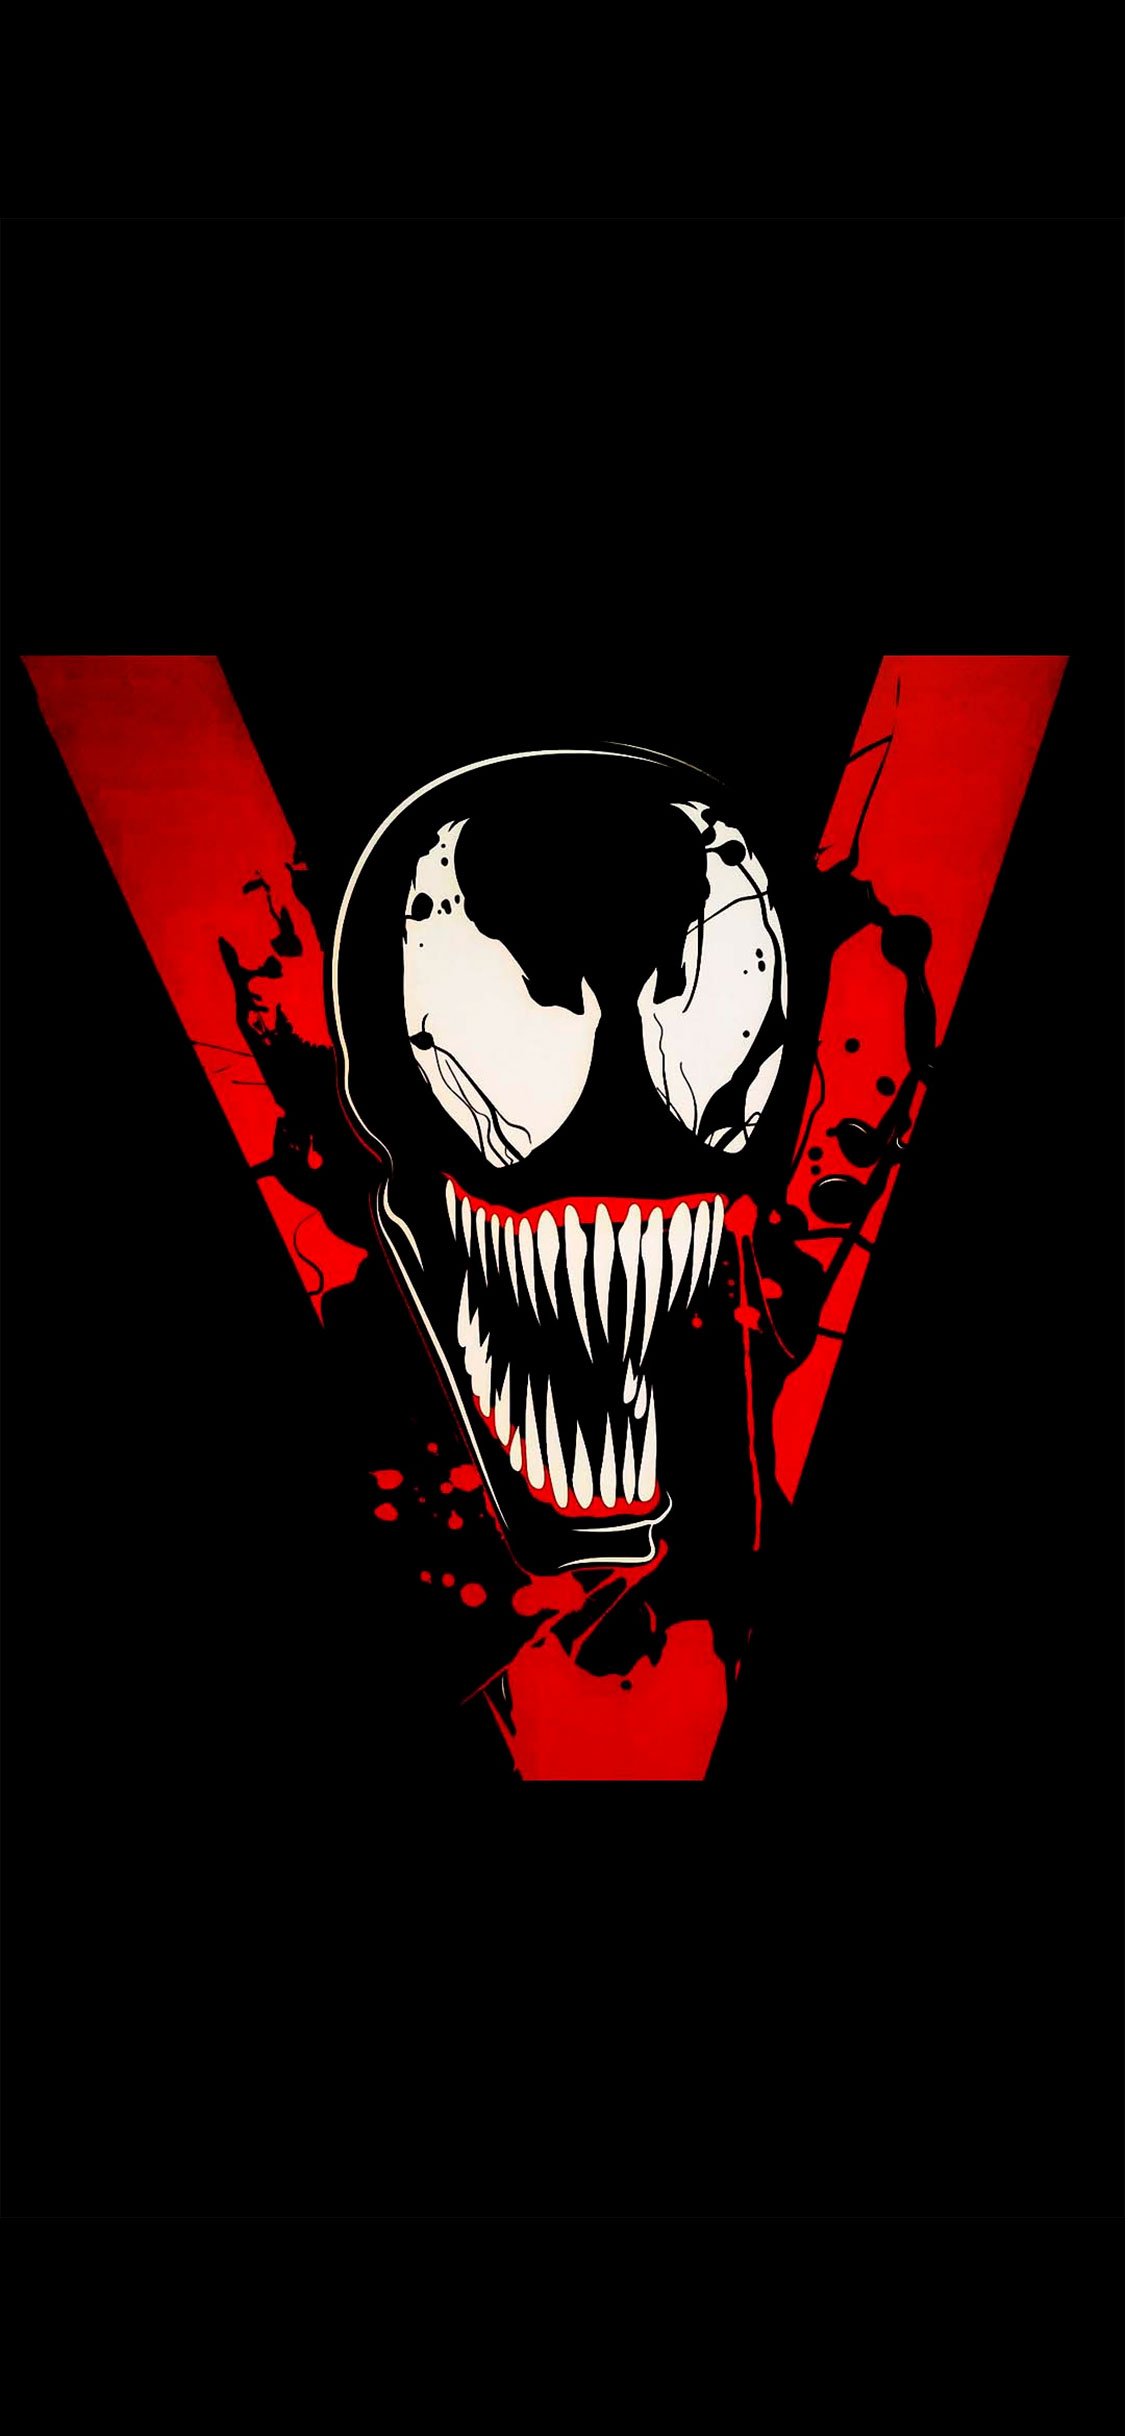 iPhone wallpaper venom2 Venom